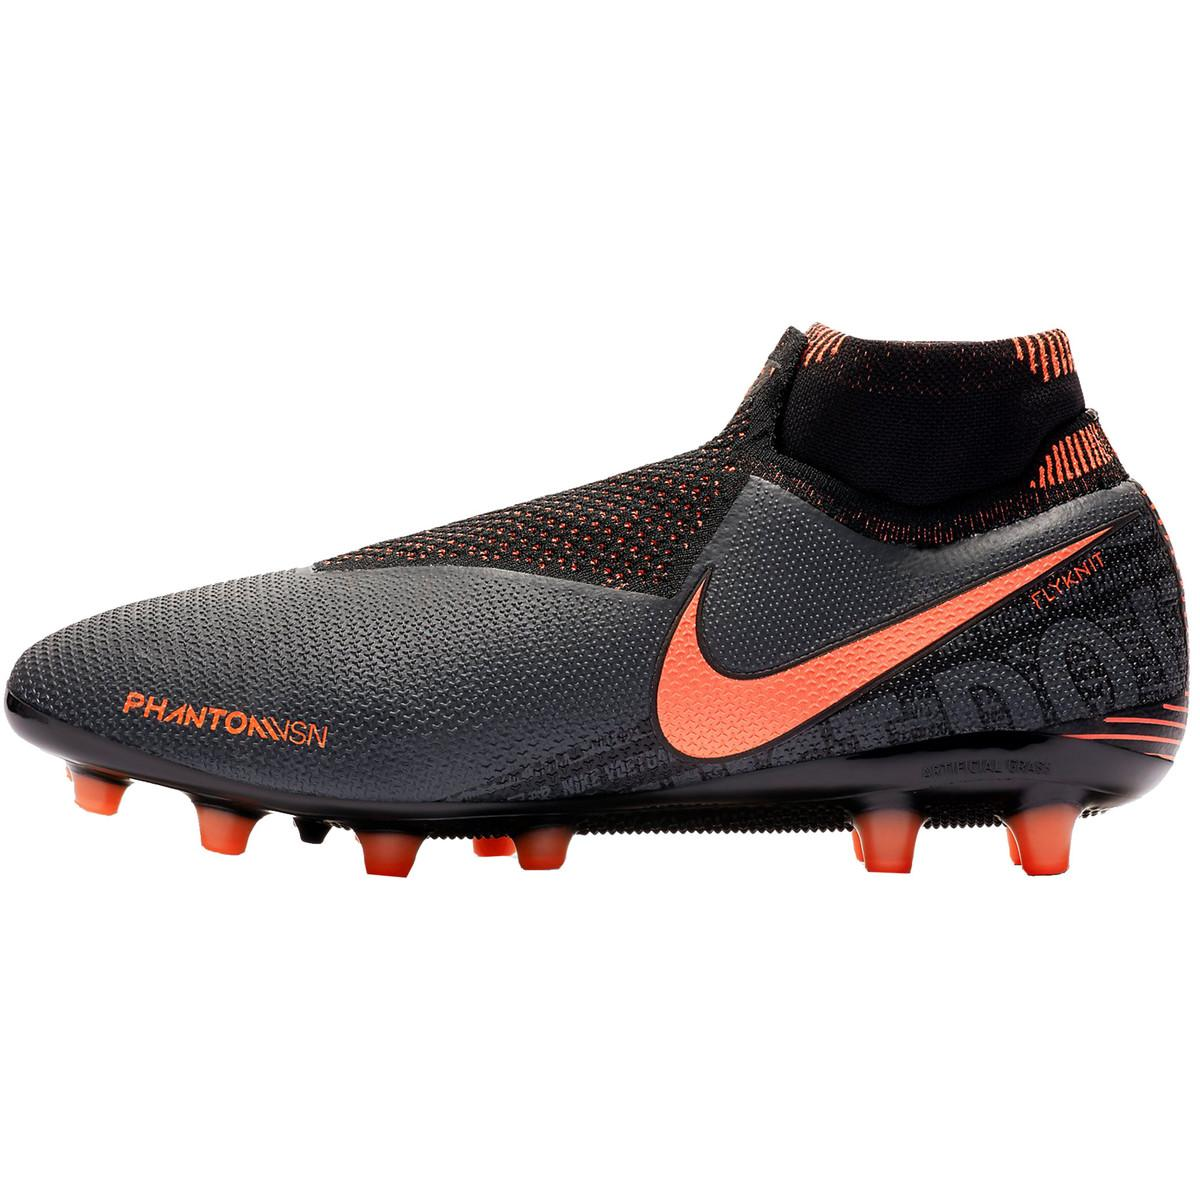 Nike Kant Voetbalschoenen Phantom Vision Elite Dynamic Fit Ag-pro in het Grijs voor heren